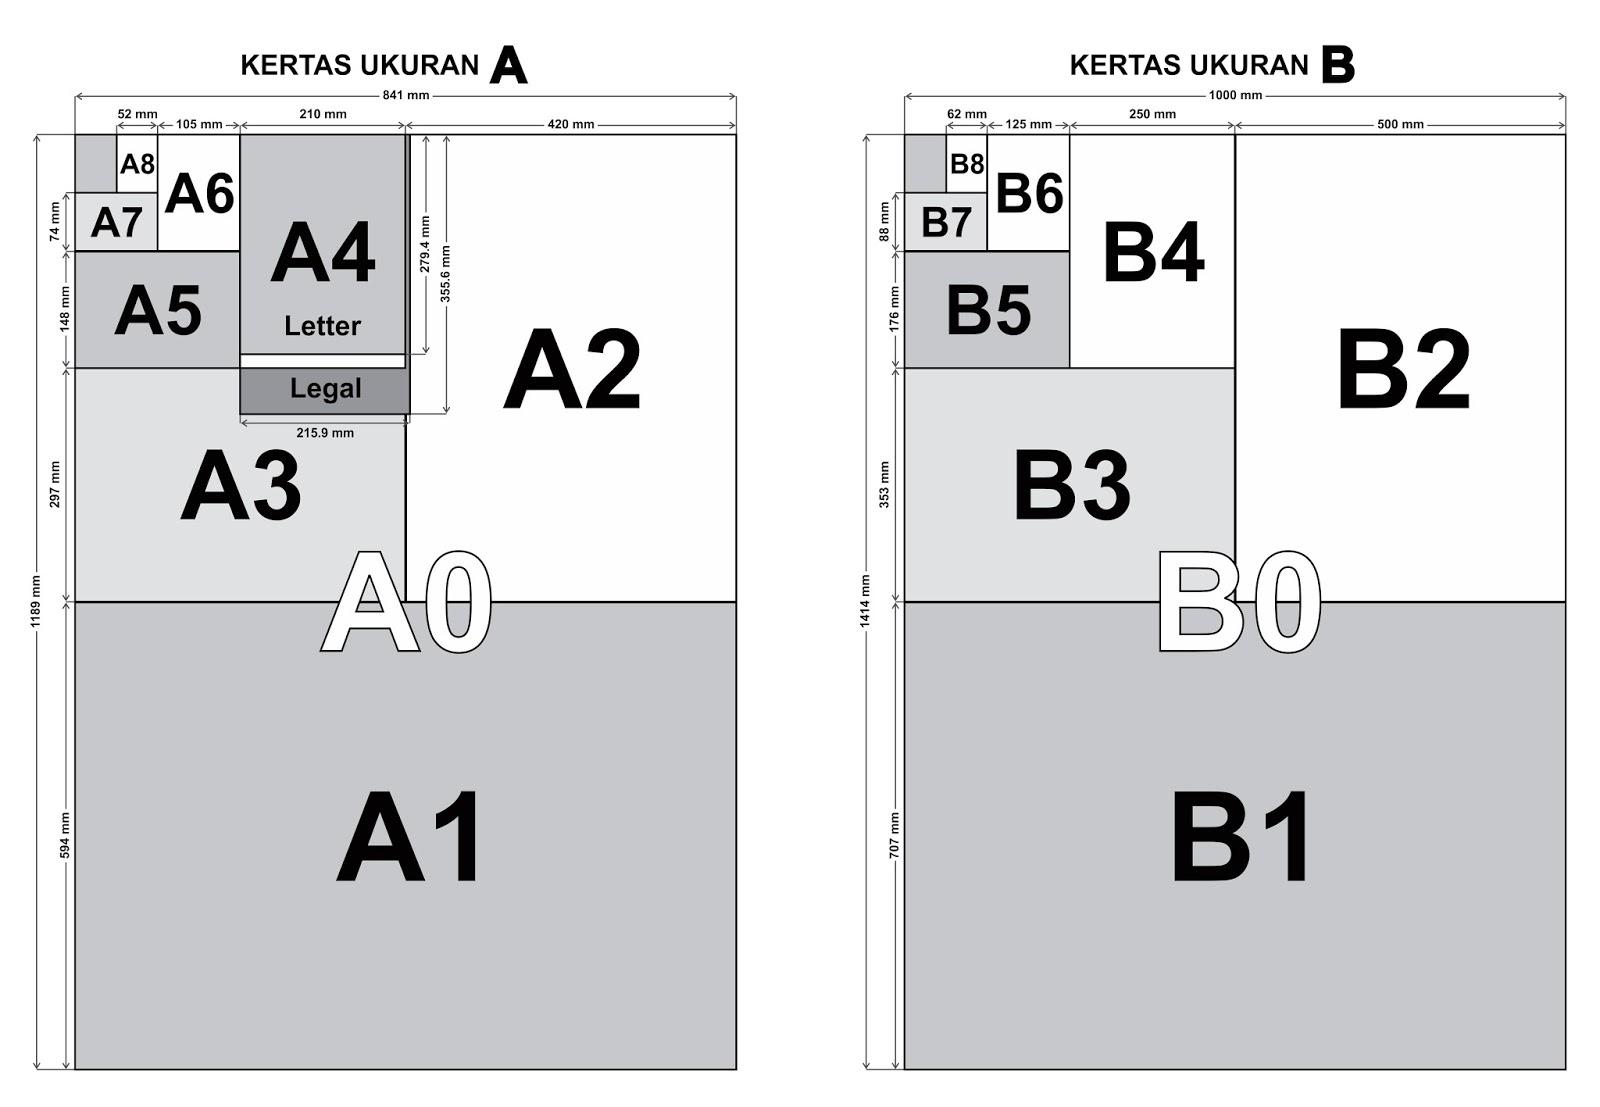 Ukuran Kertas Standar ISO - Konsep Desain Grafis